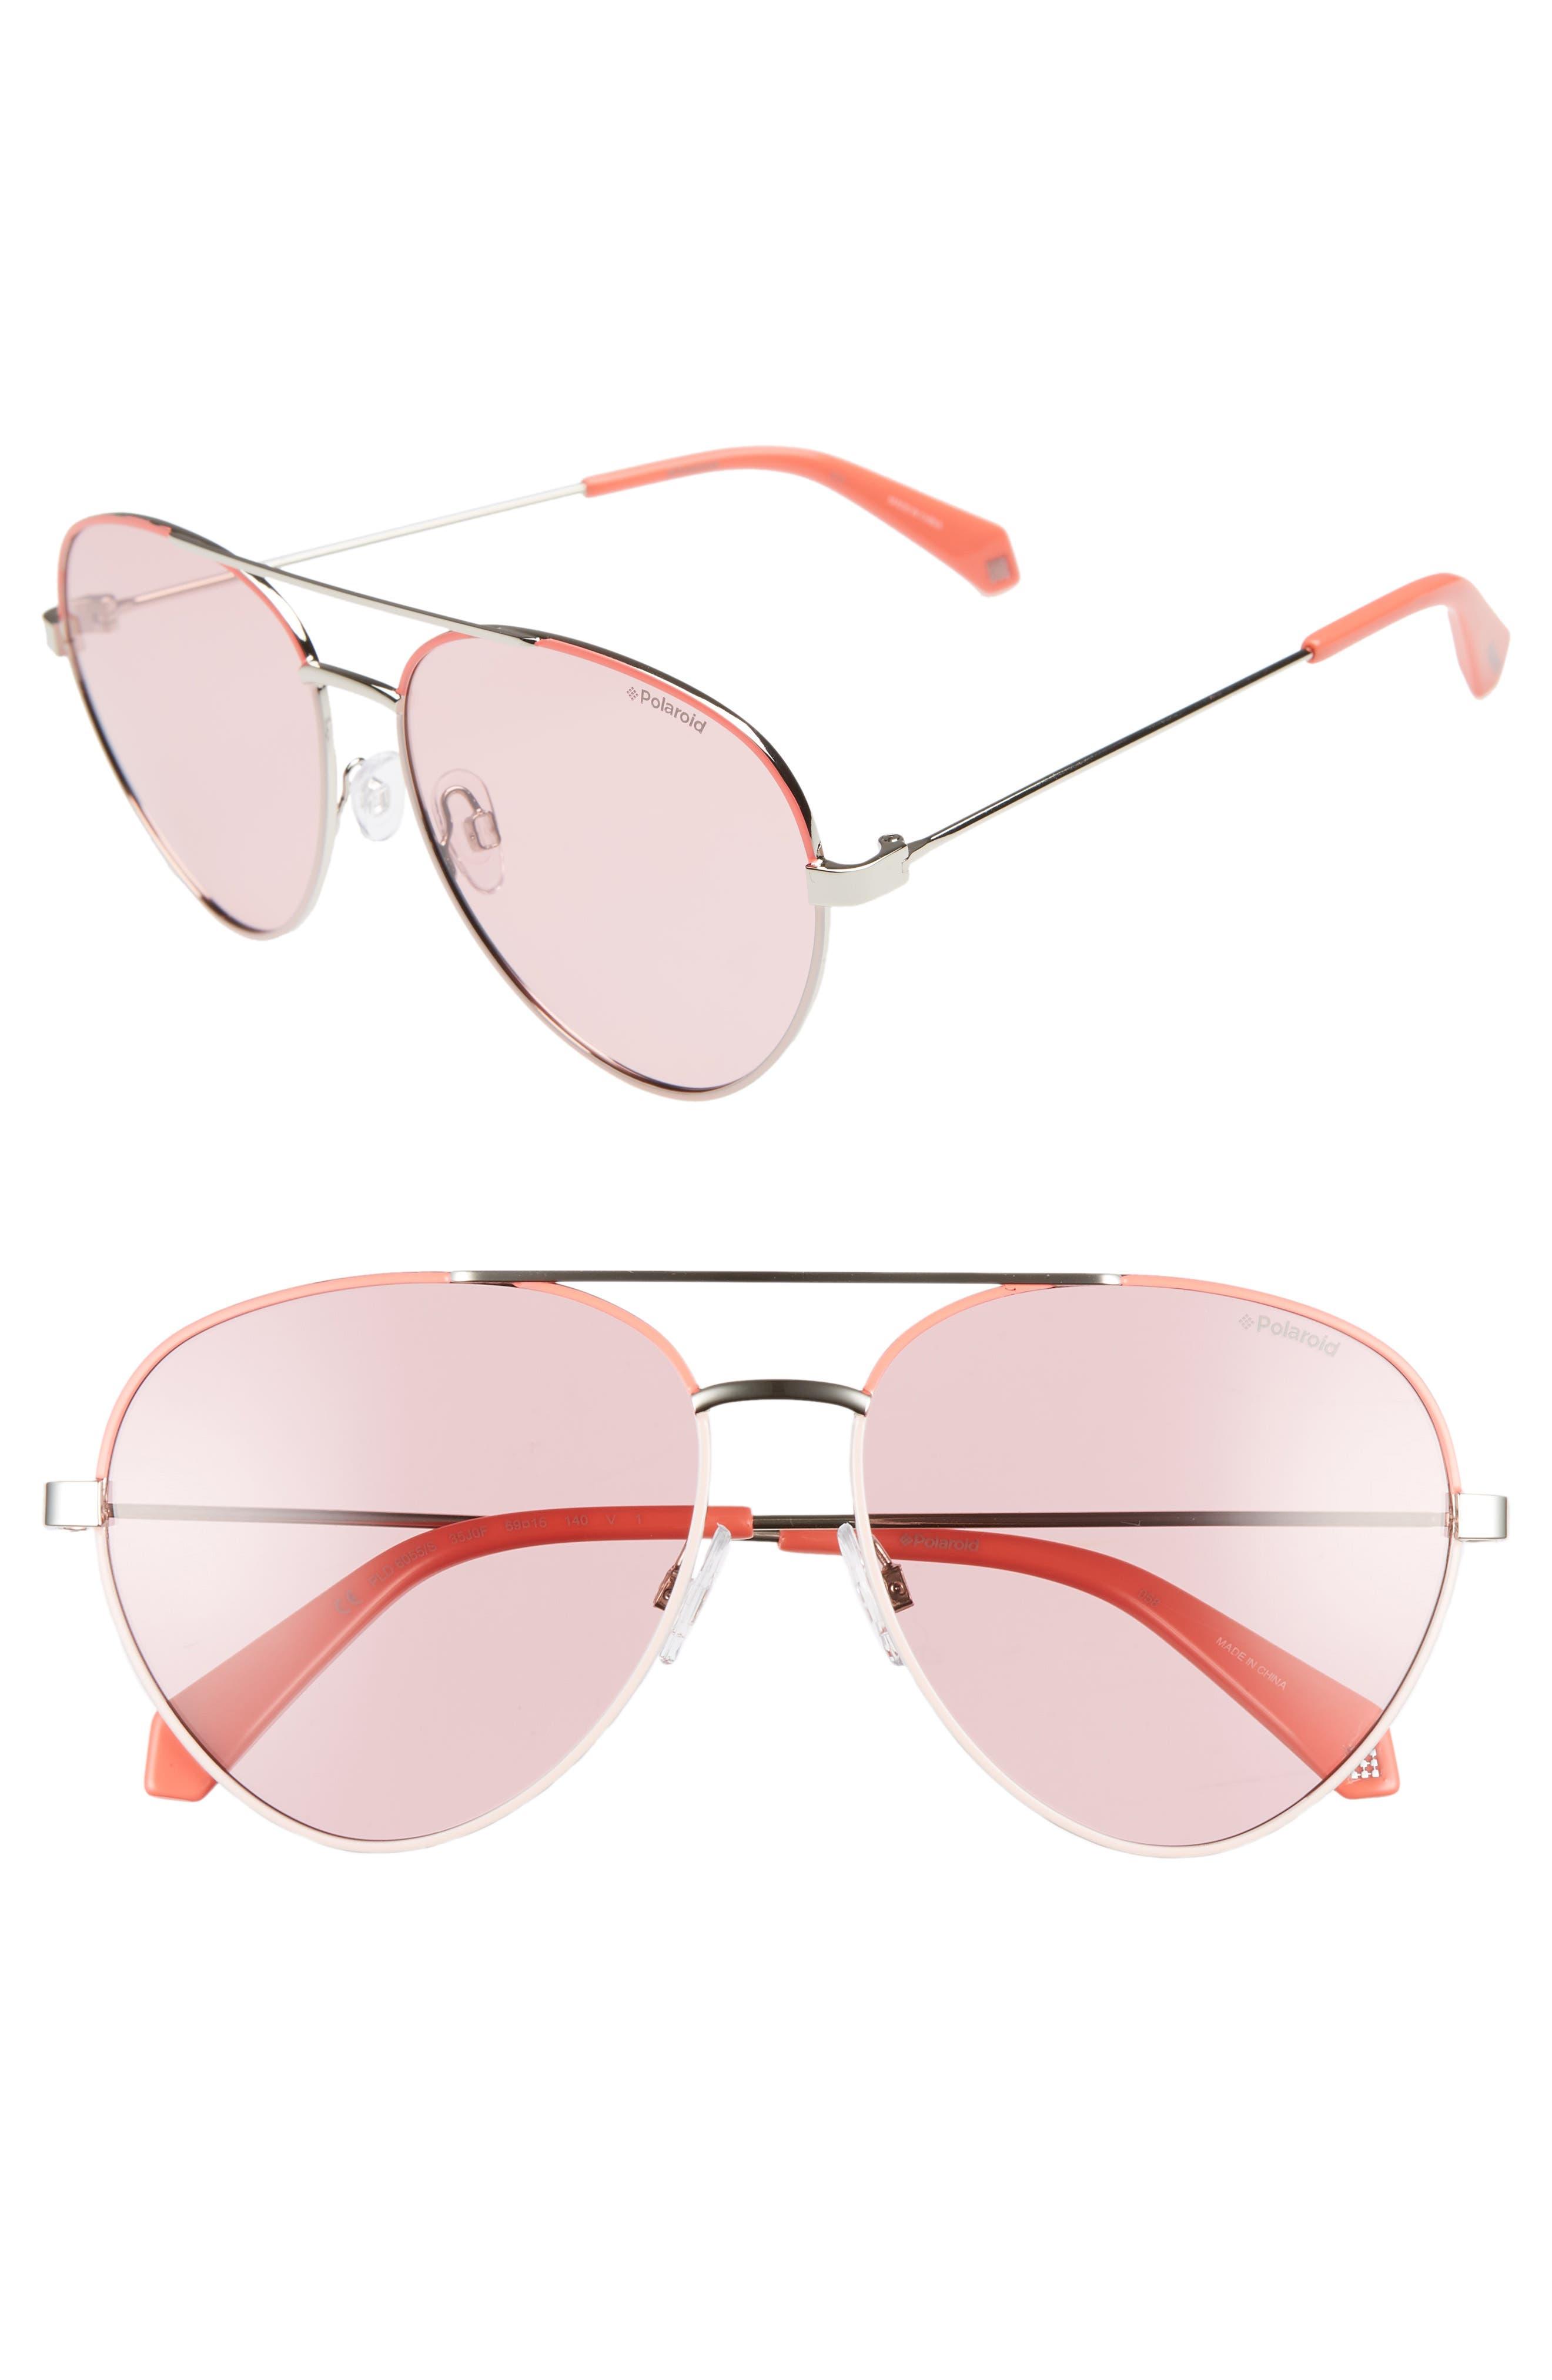 Polaroid 5m Polarized Aviator Sunglasses - Pink